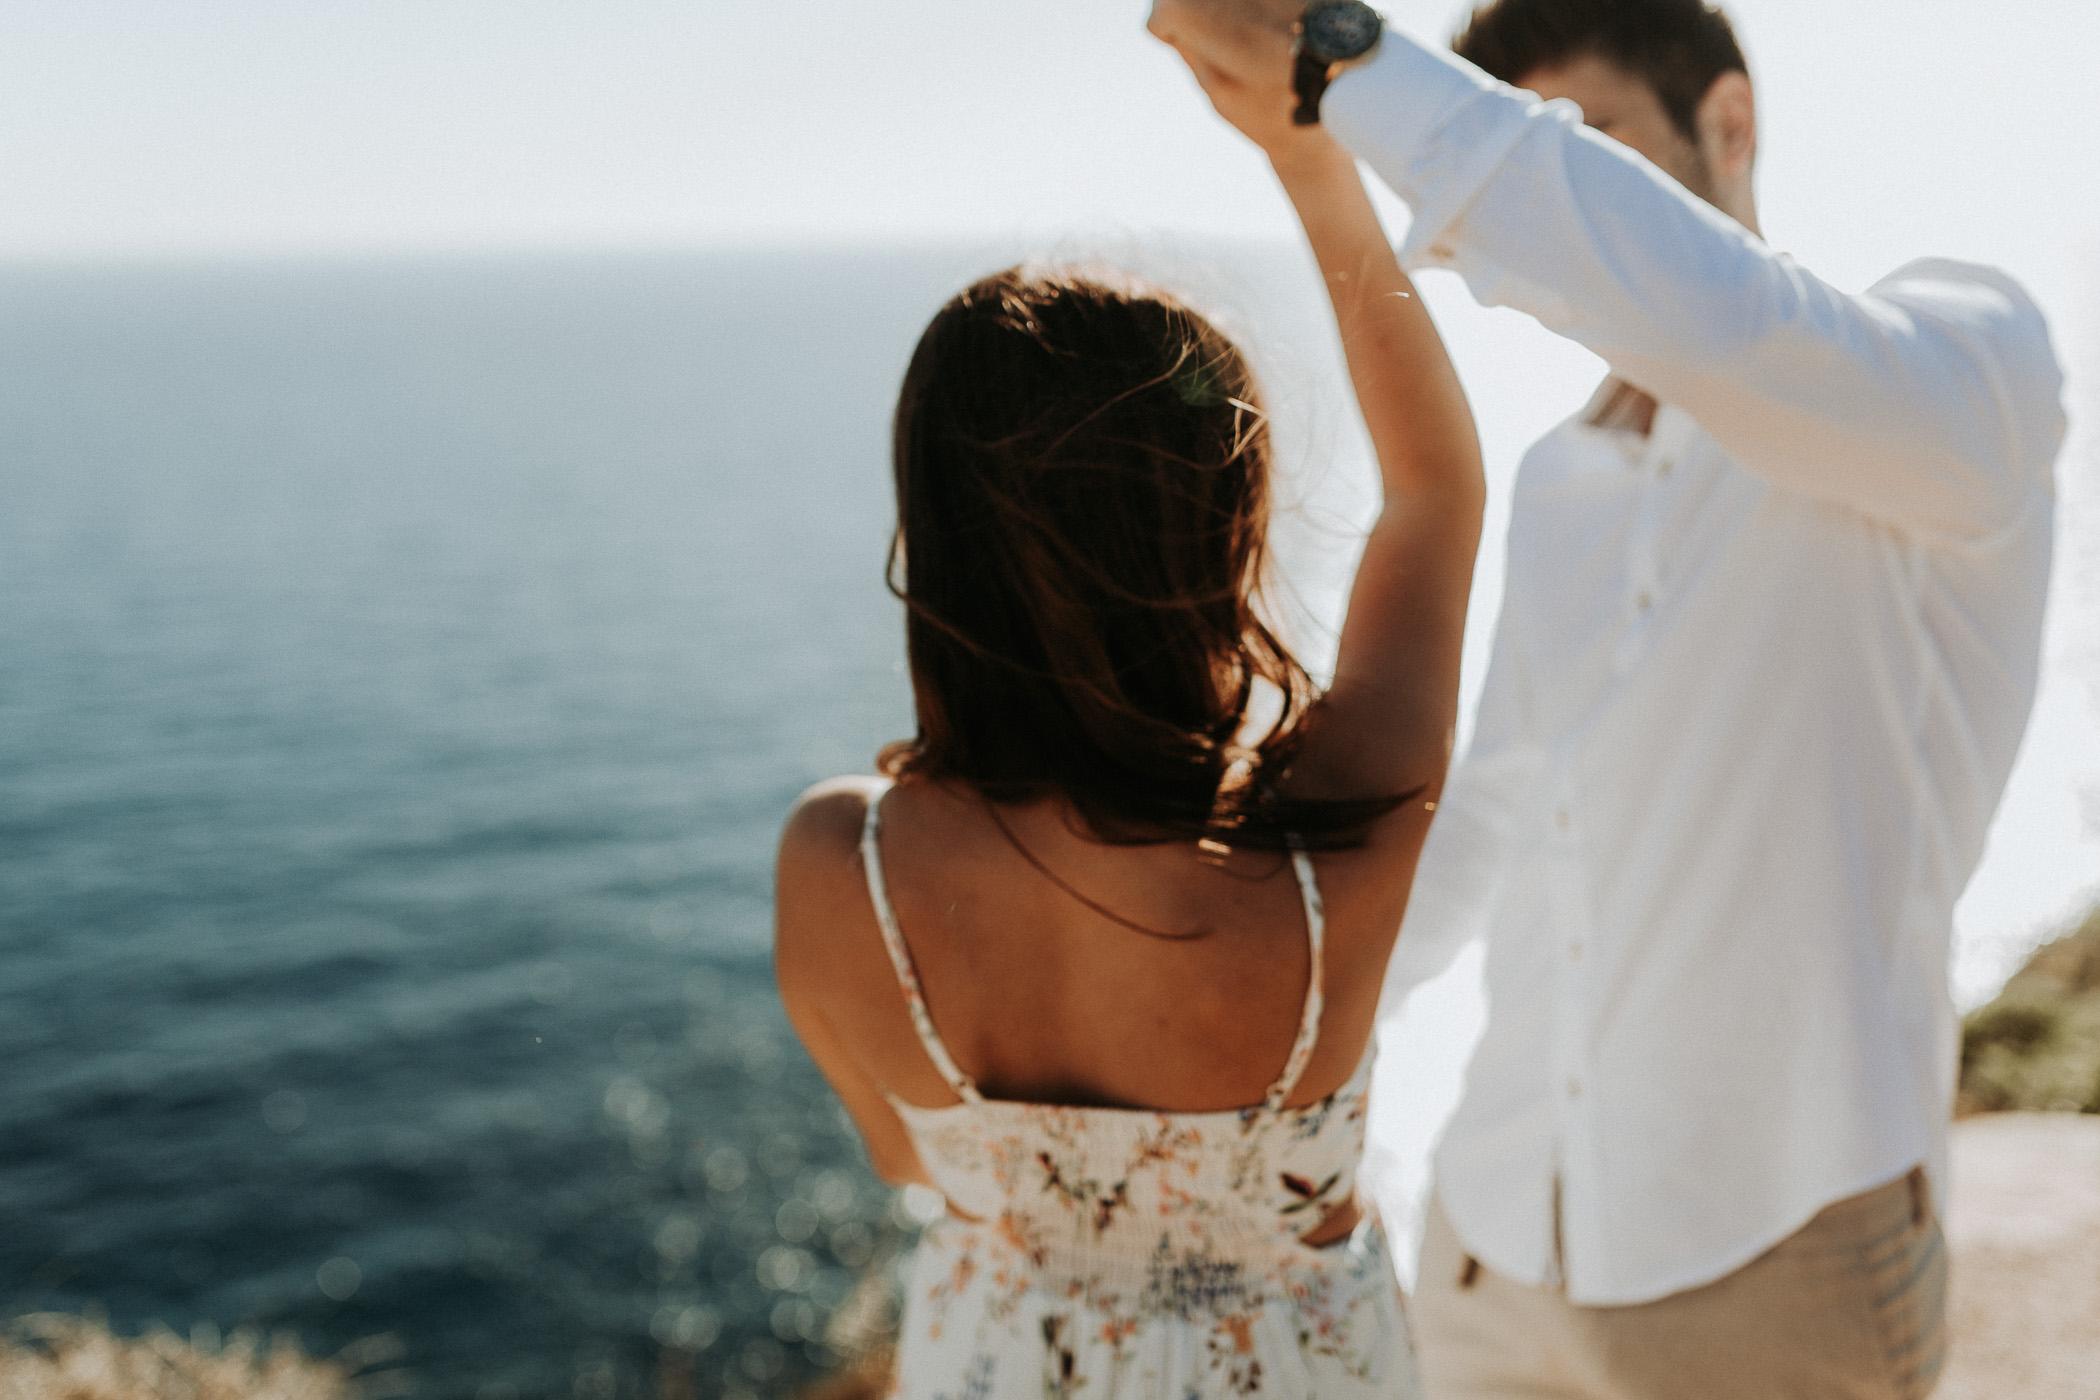 DanielaMarquardtPhotography_wedding_elopement_mallorca_spain_calapi_palma_lauraandtoni_91